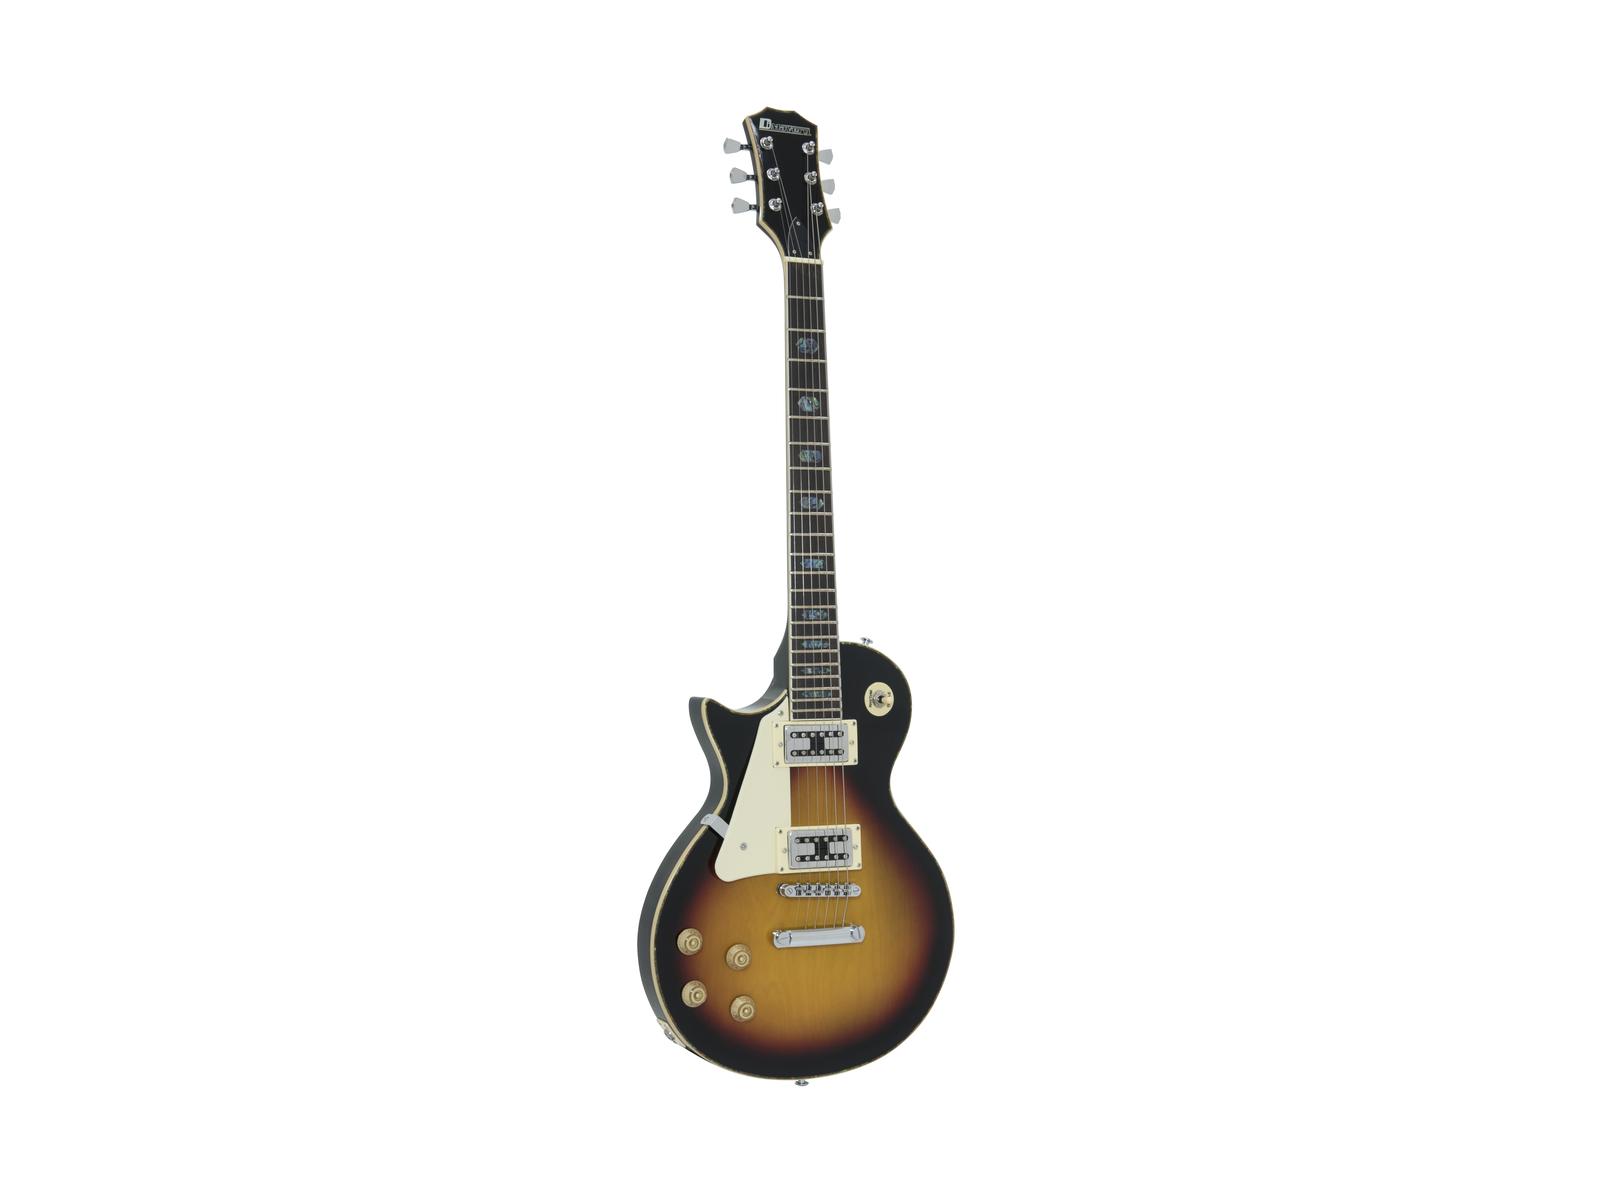 DIMAVERY LP-700L E-Gitarre, LH, sunburst